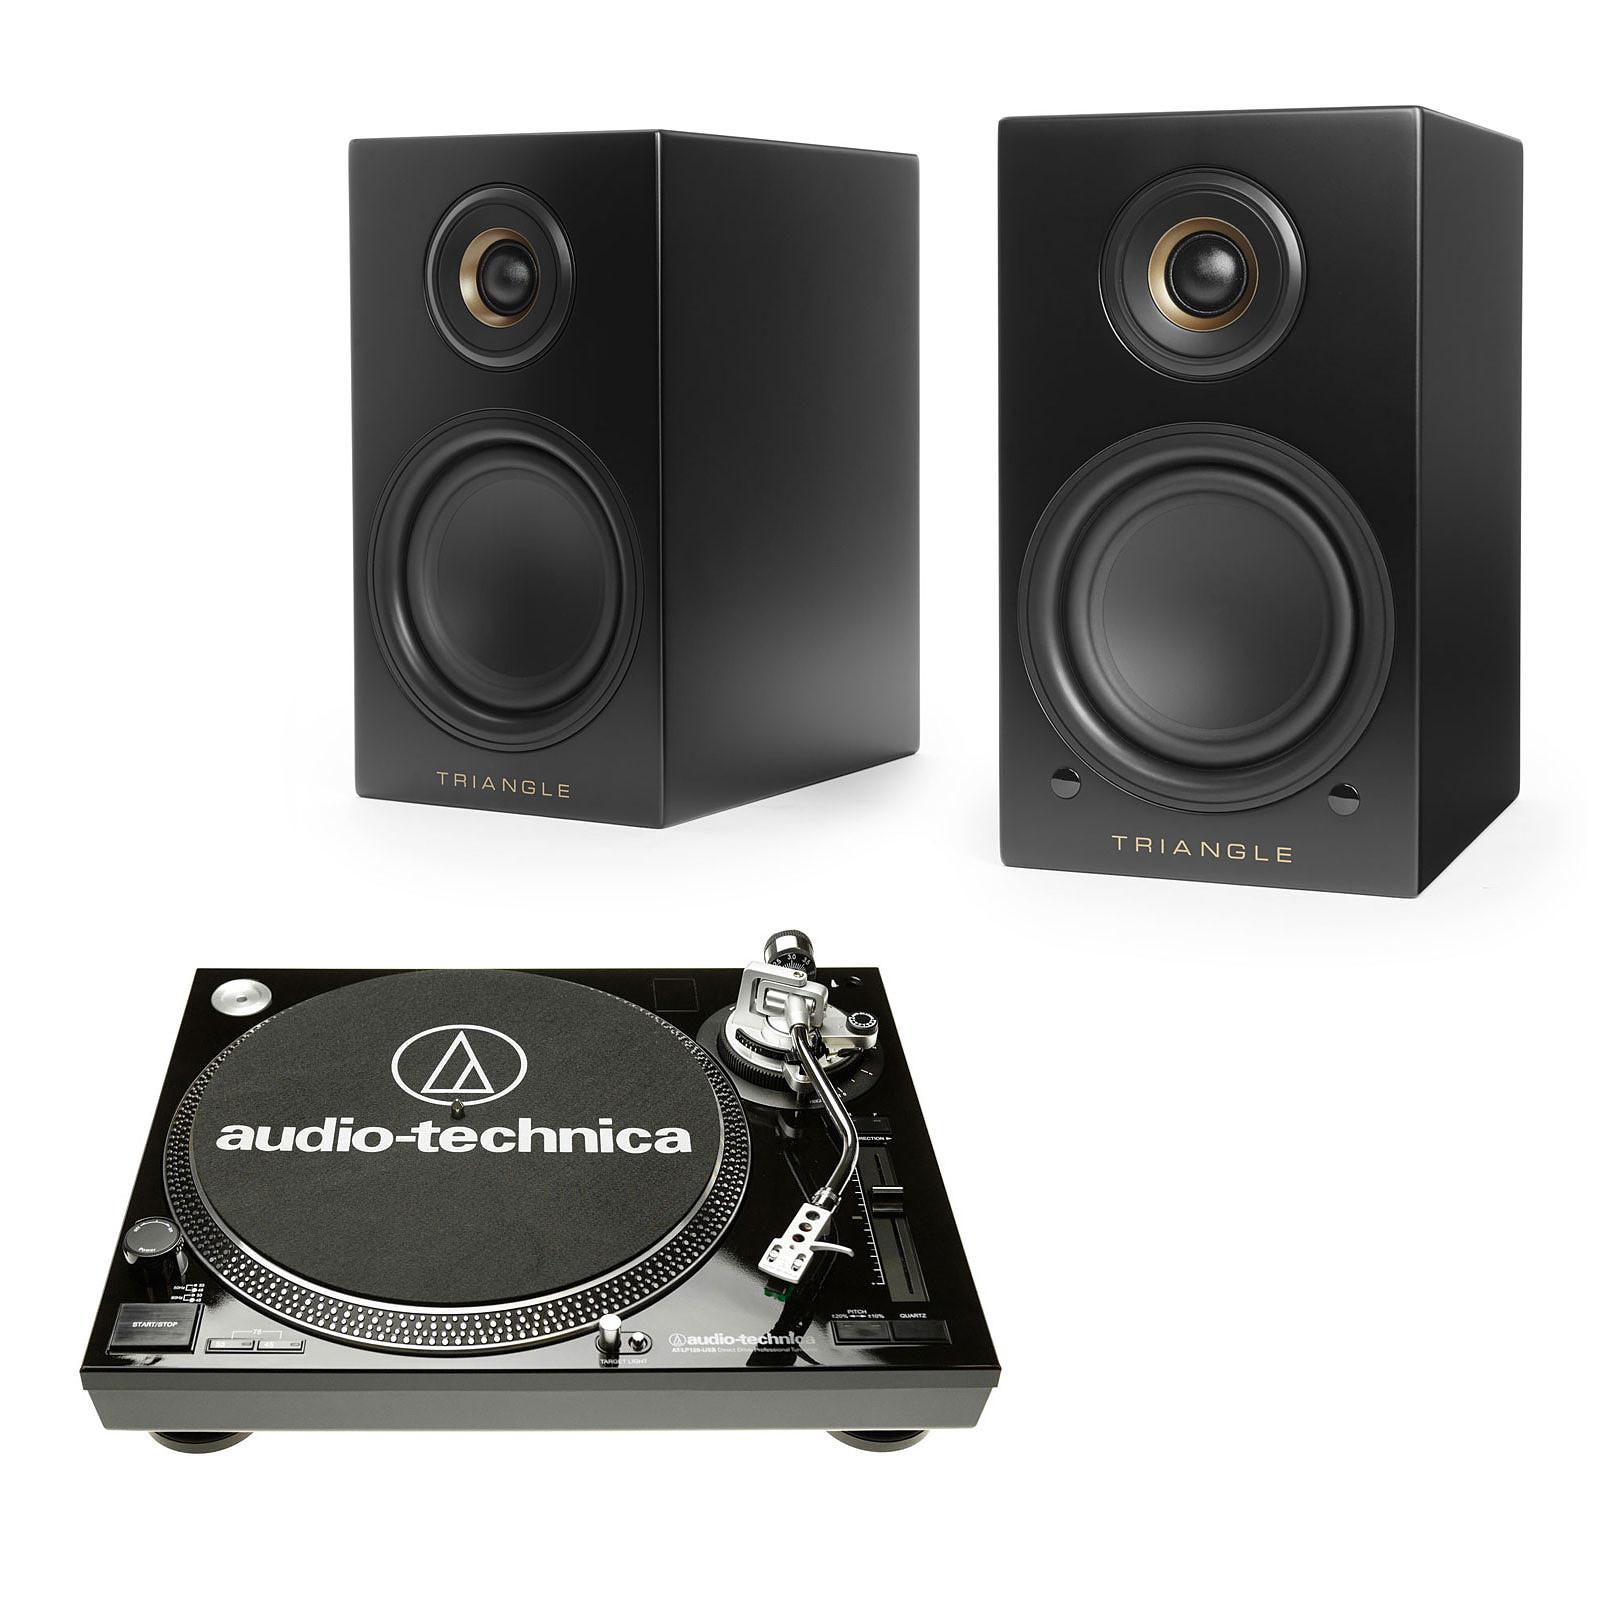 Audio-Technica AT-LP120USBC Noir + Triangle Elara LN01A Noir mat